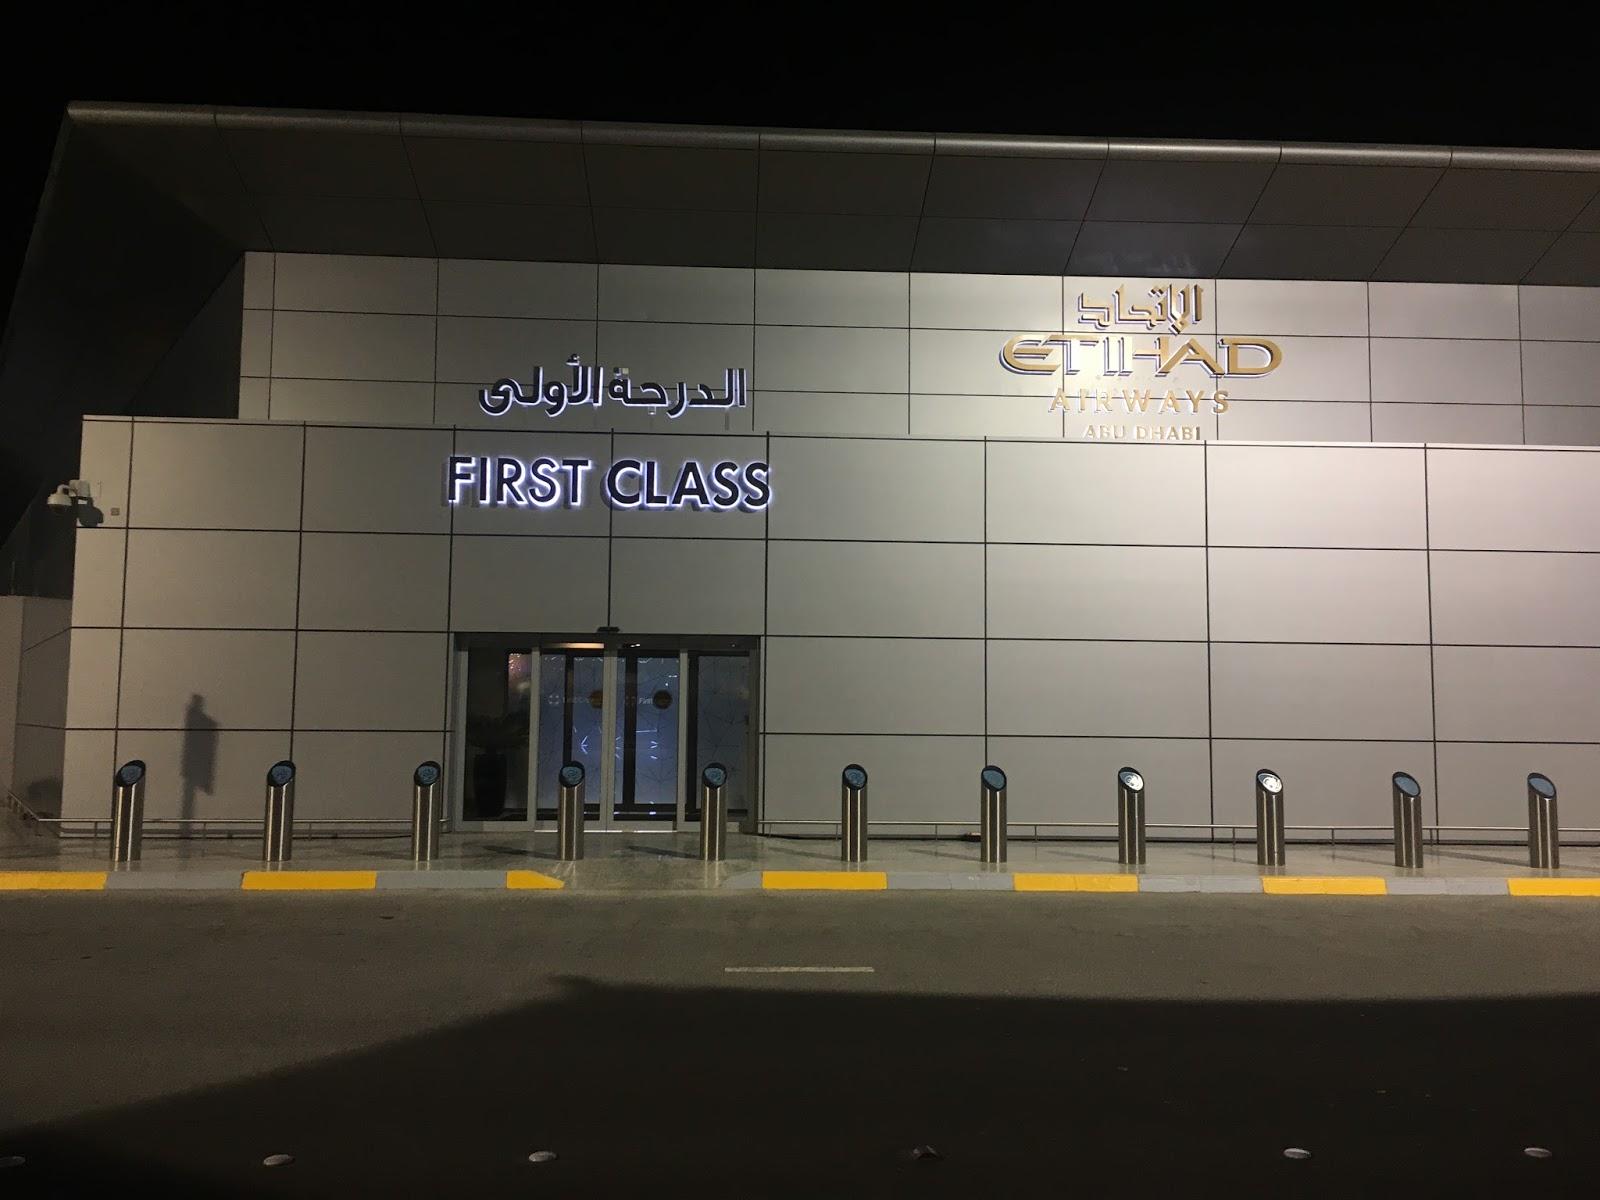 Pic etihad airways a380 first class apartment 4k may 2015 - Auh Etihad Airways First Class Check In